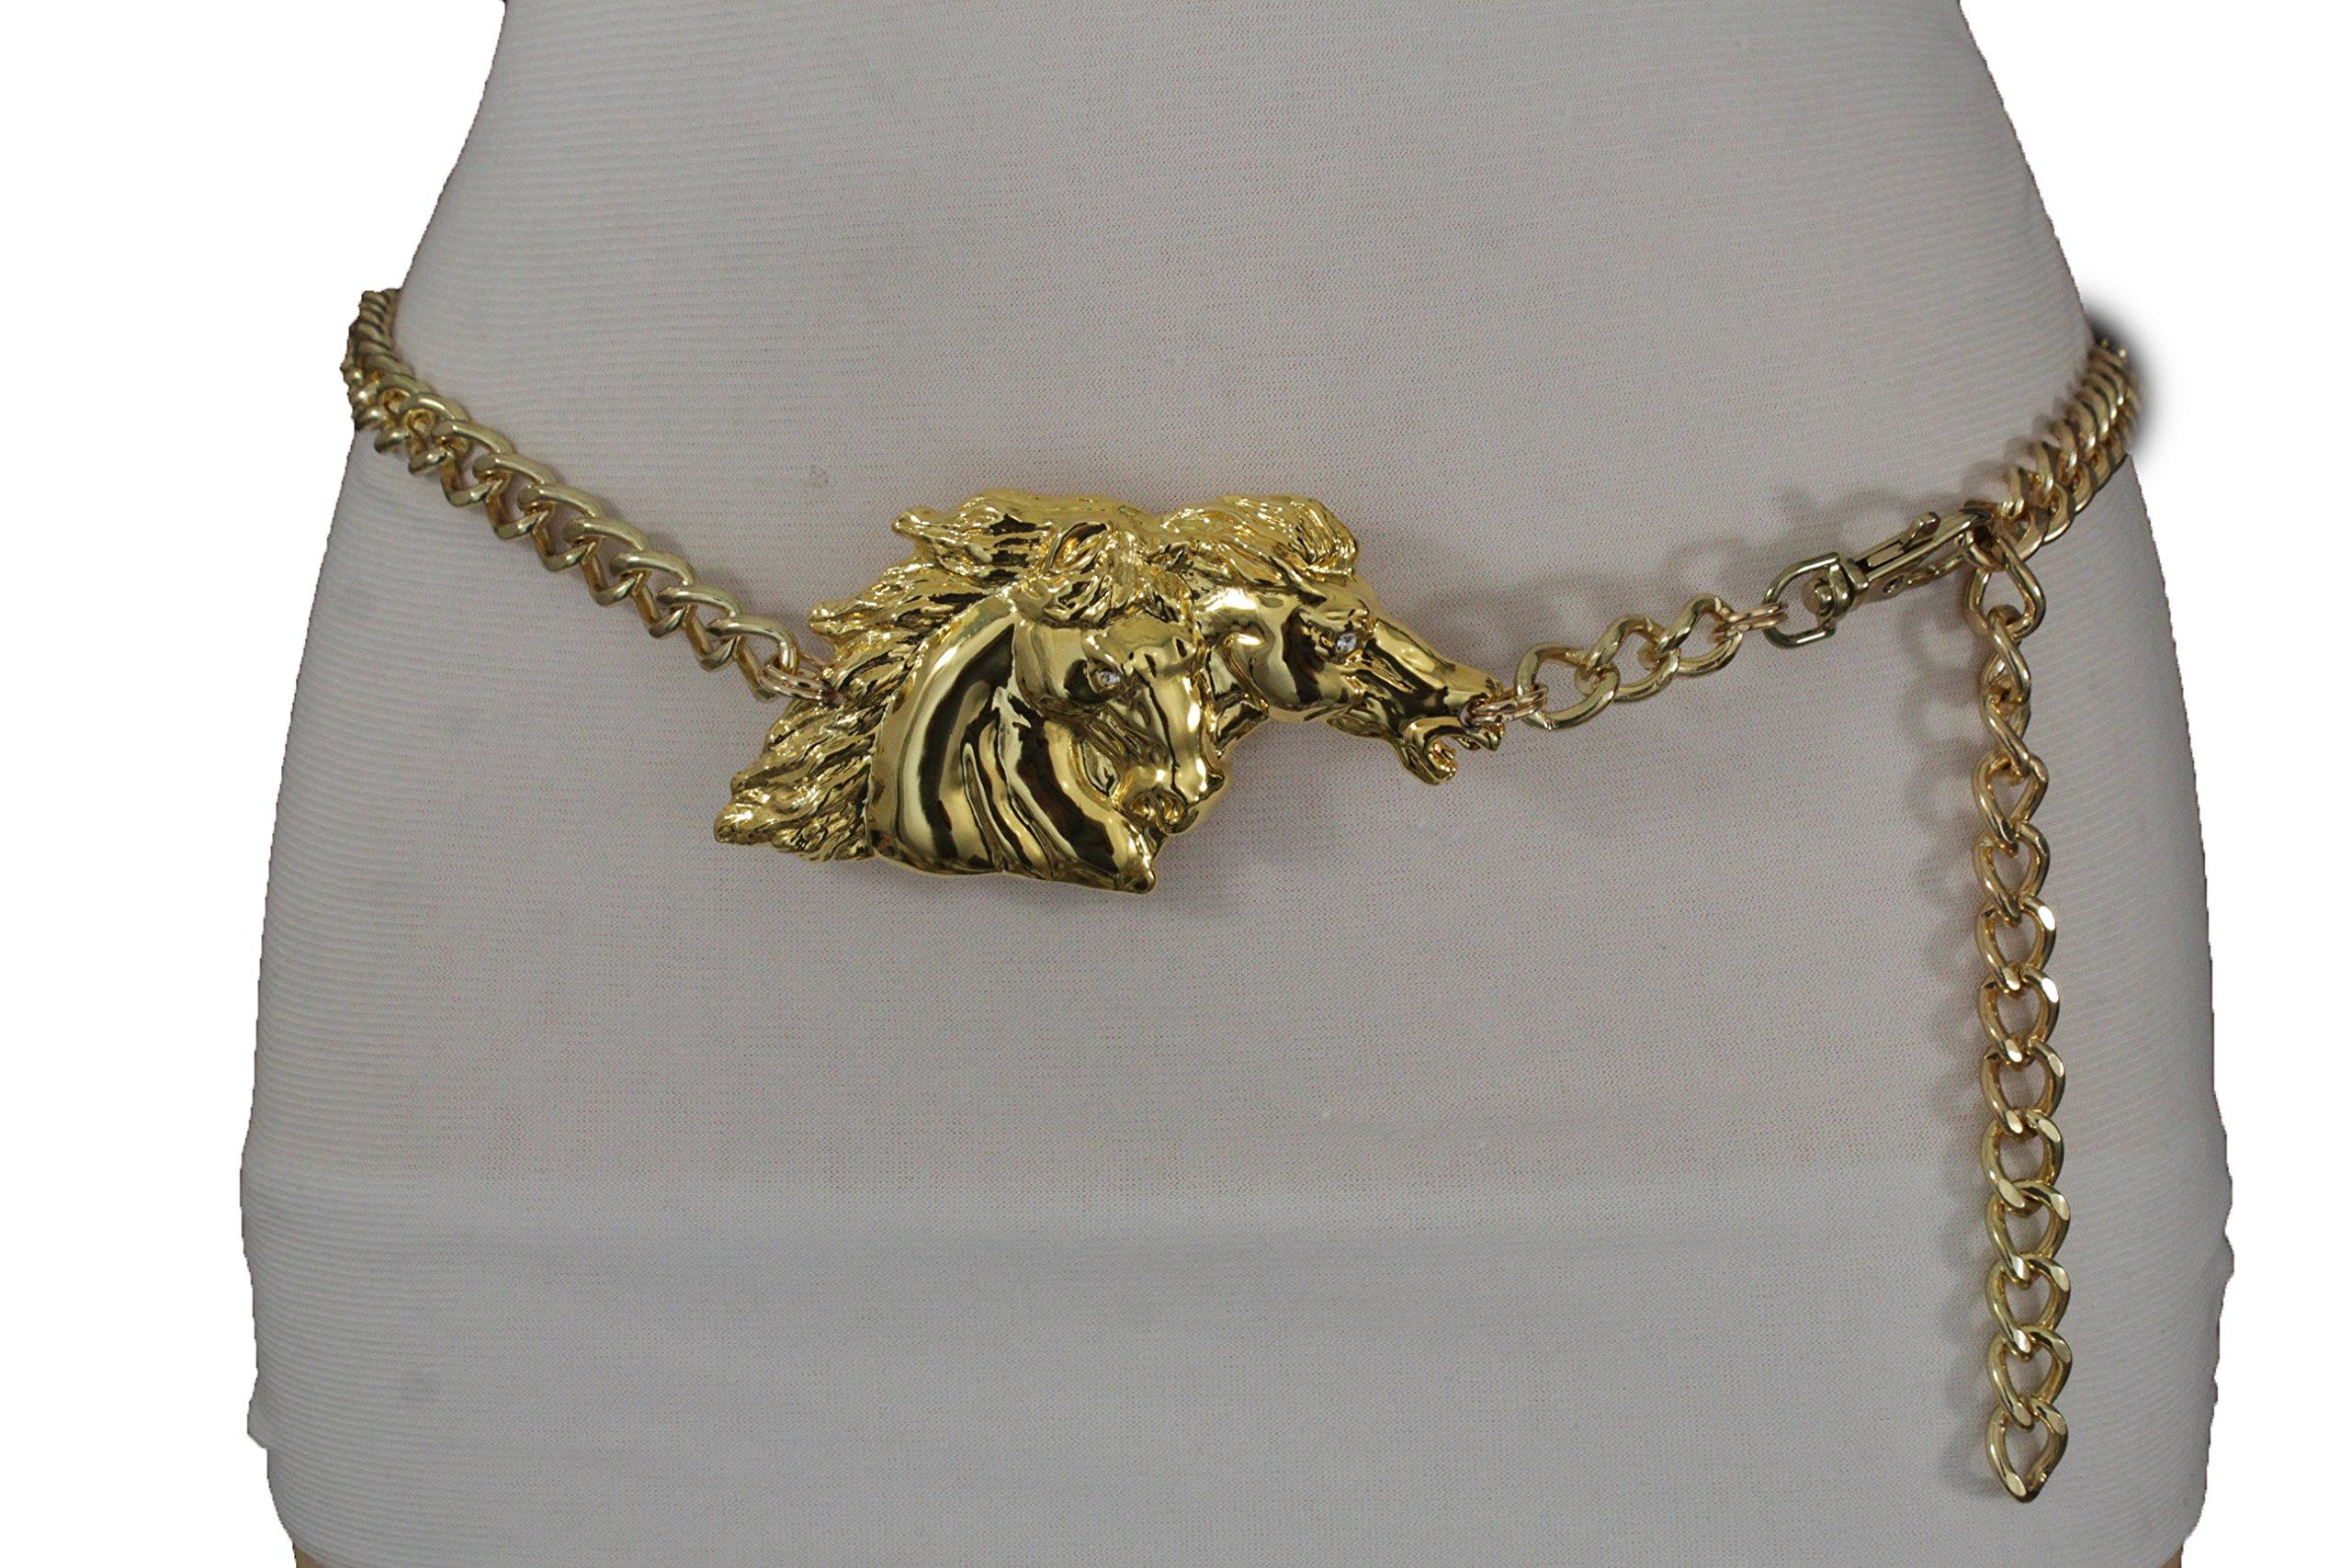 TFJ Women Fashion Belt Hip Waist Metal Chains Horse Buckle Plus M L XL Gold